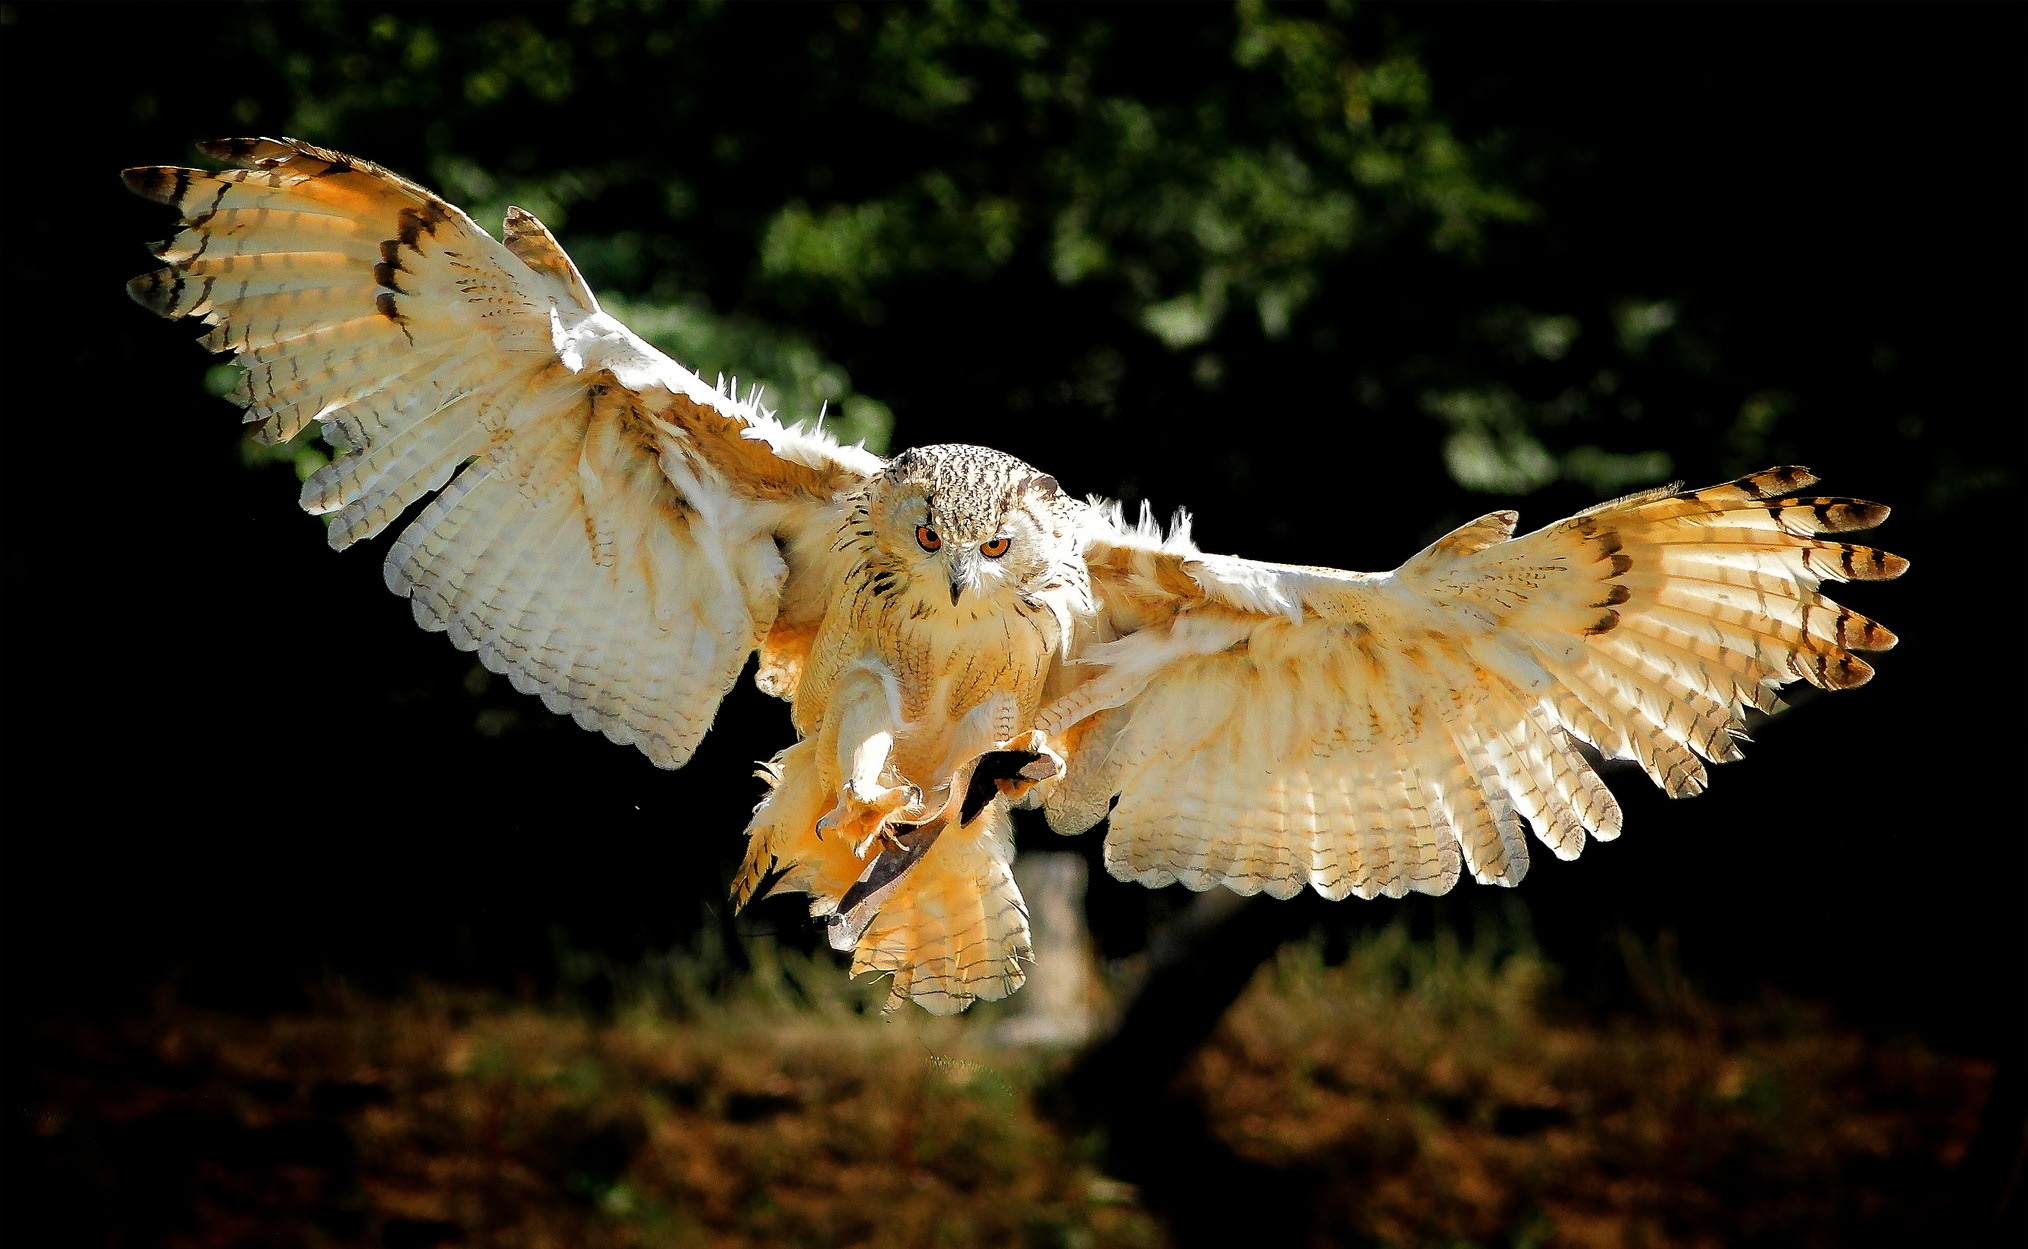 Owl bird flying wings wallpaper 2028x1249 196024 WallpaperUP 2028x1249